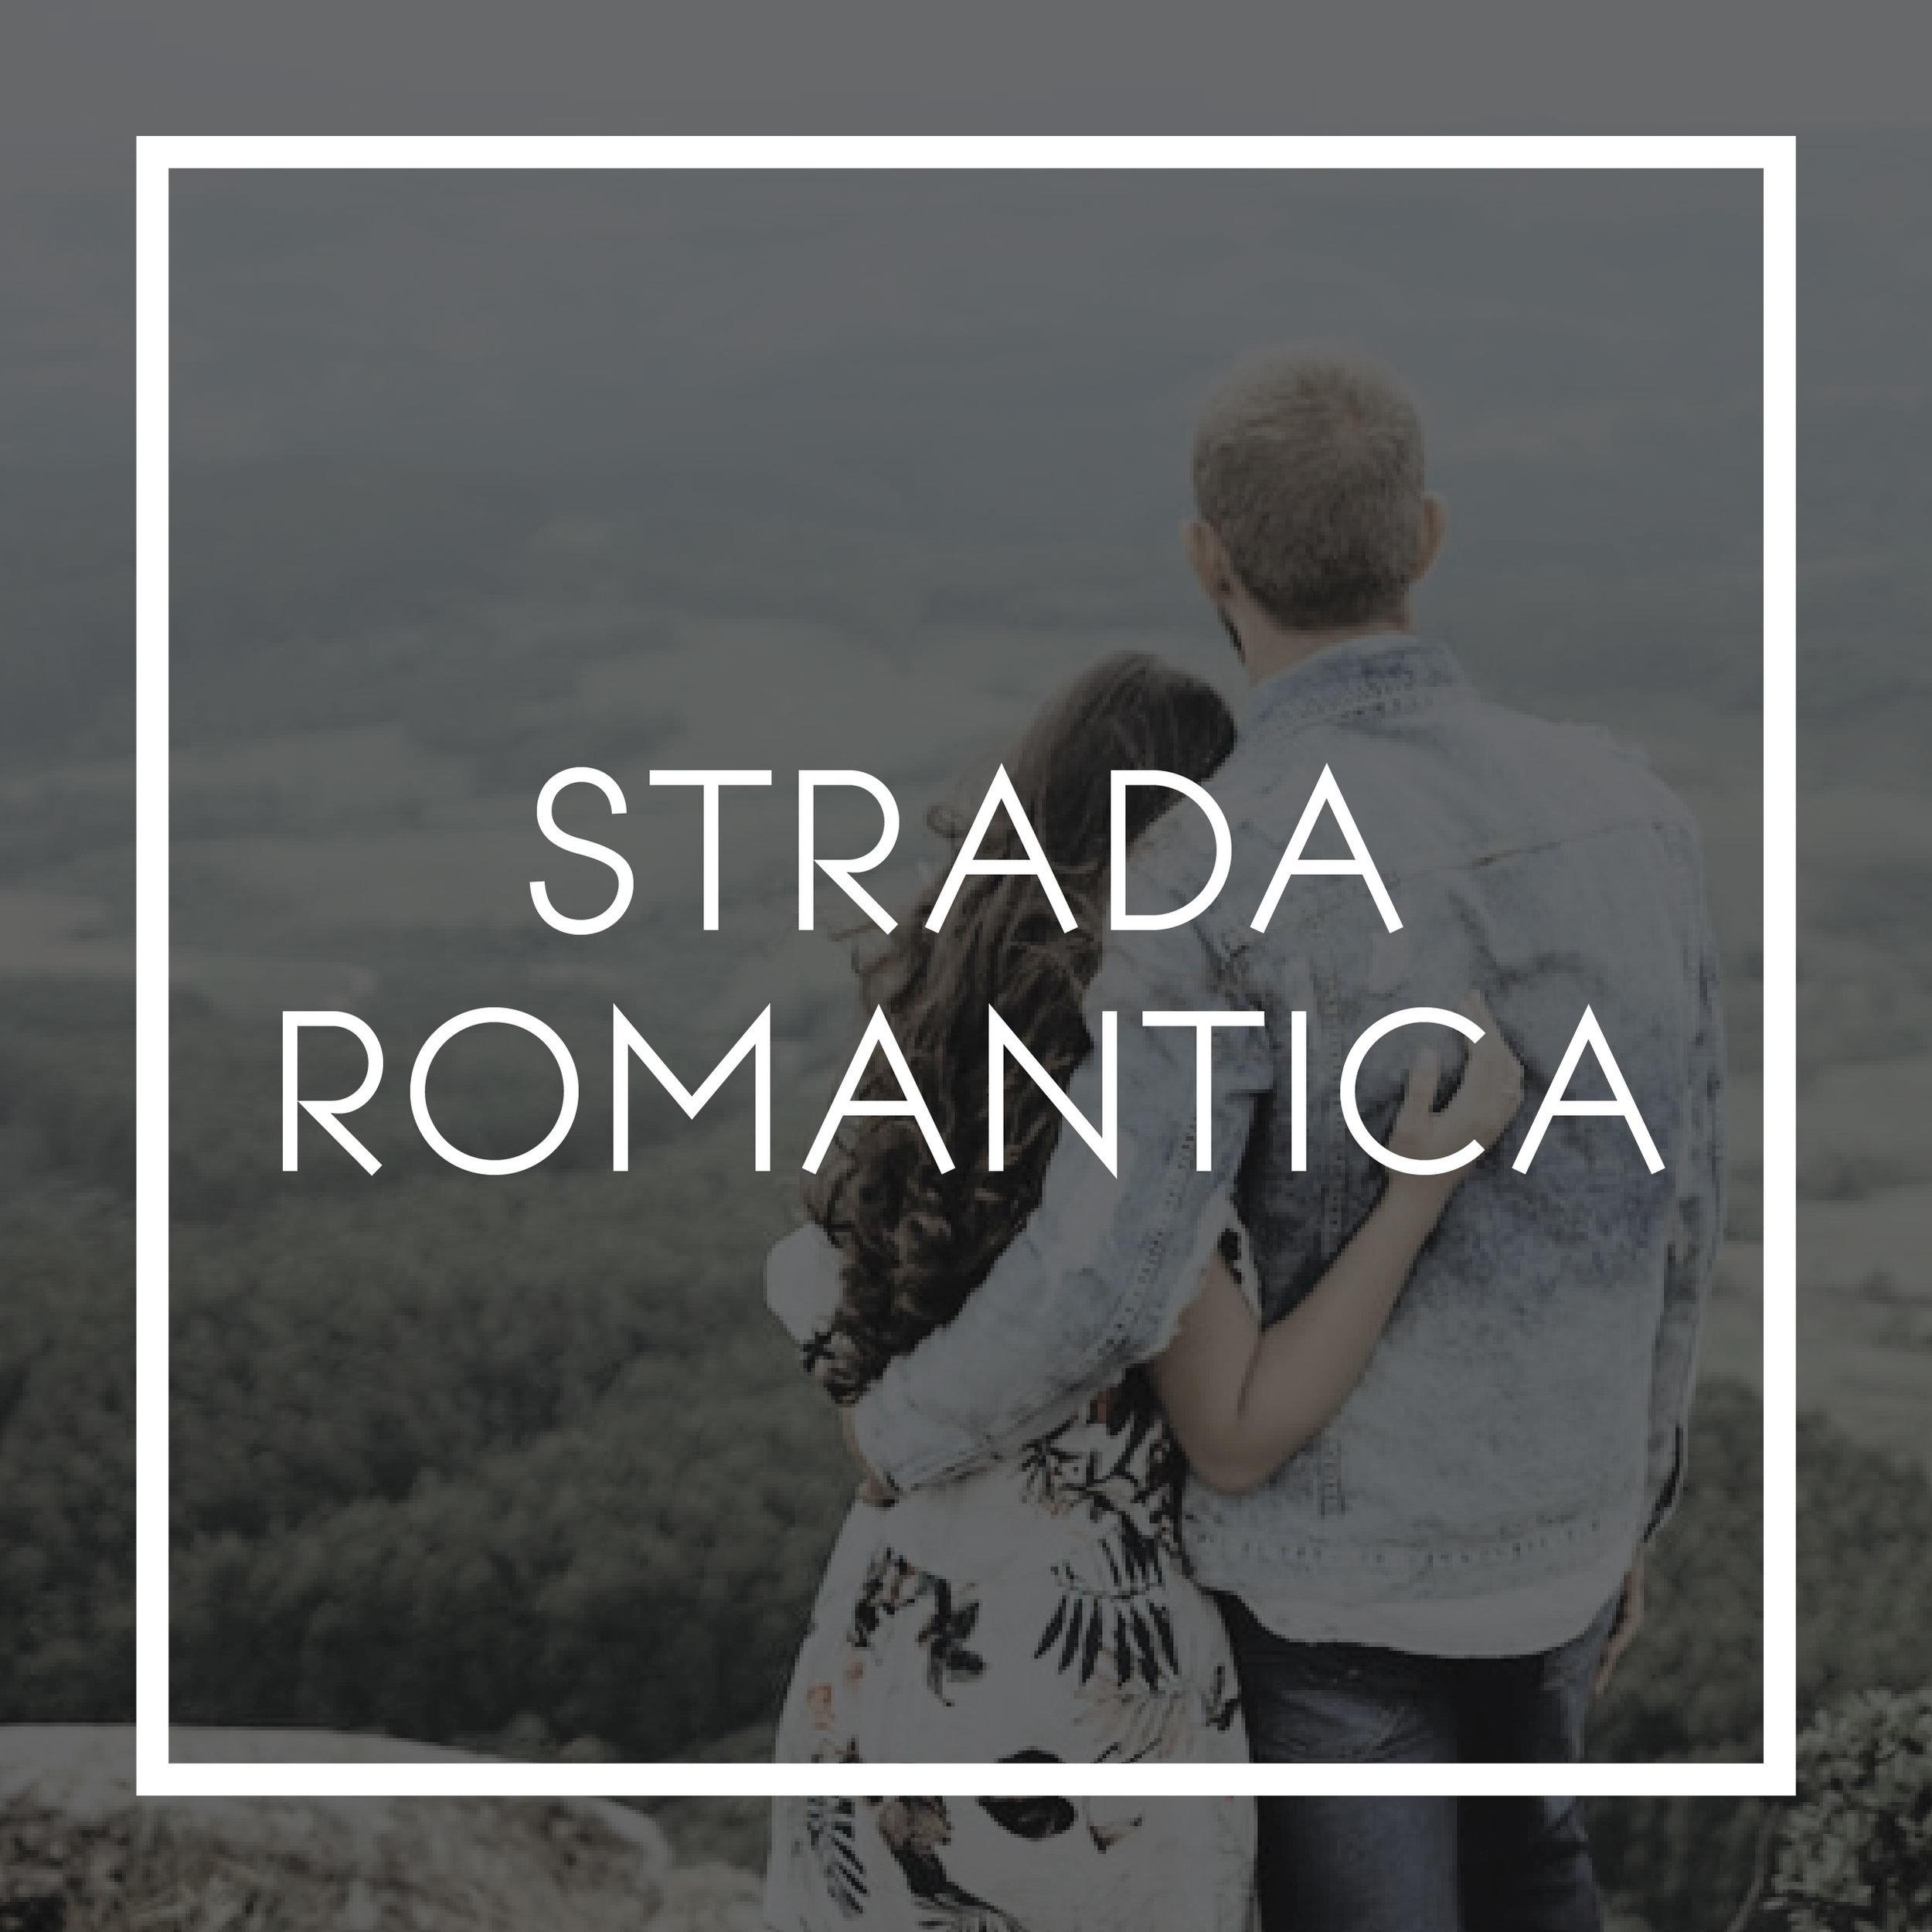 strada_romantica.jpg